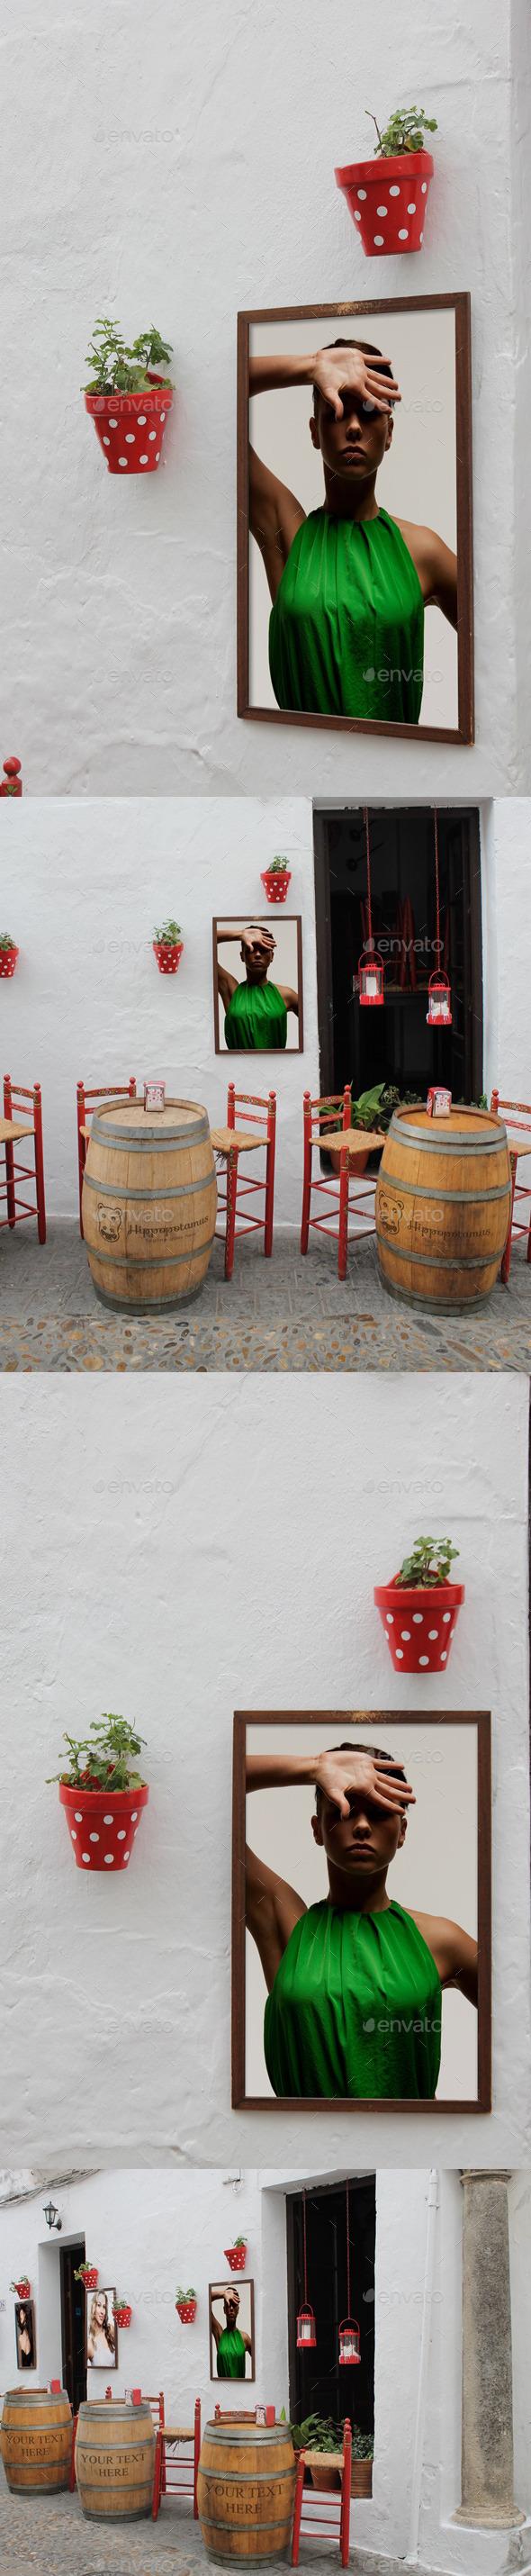 Spanish Tabern Mock-Up - Product Mock-Ups Graphics